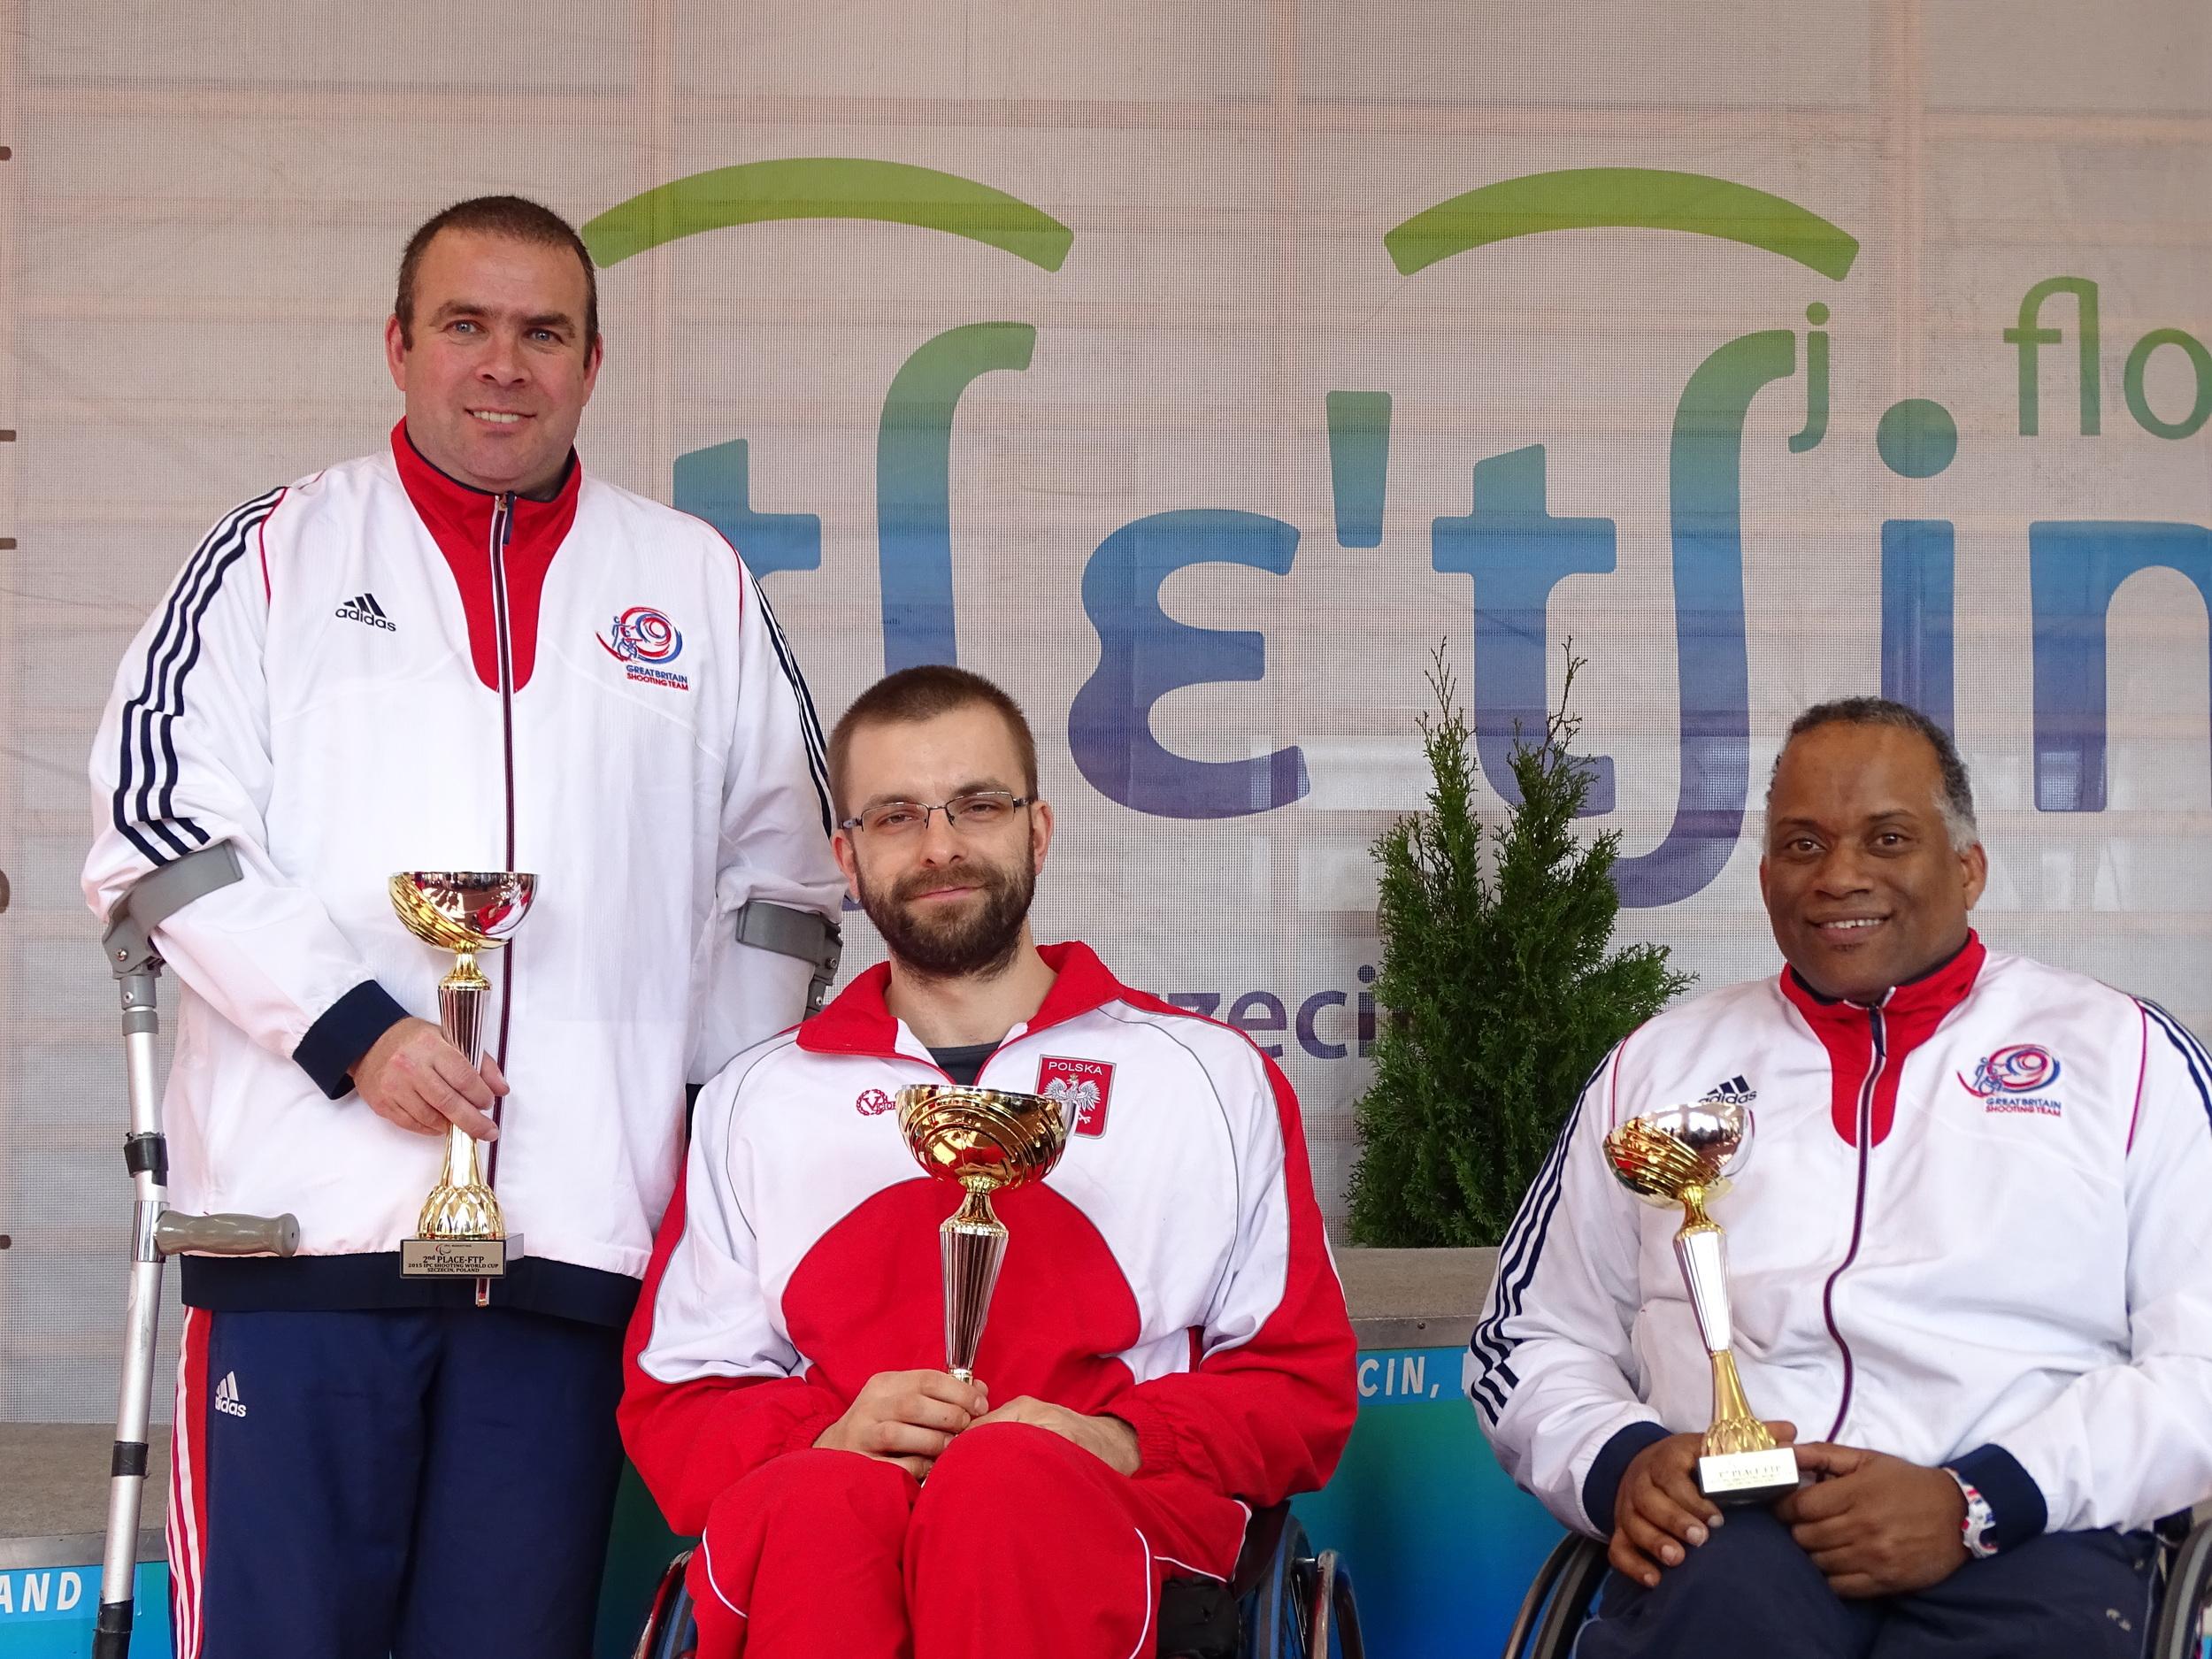 Falling Target Pistol, Bronze Medallist Roy Carter, Silver Medallist Steart Nangle